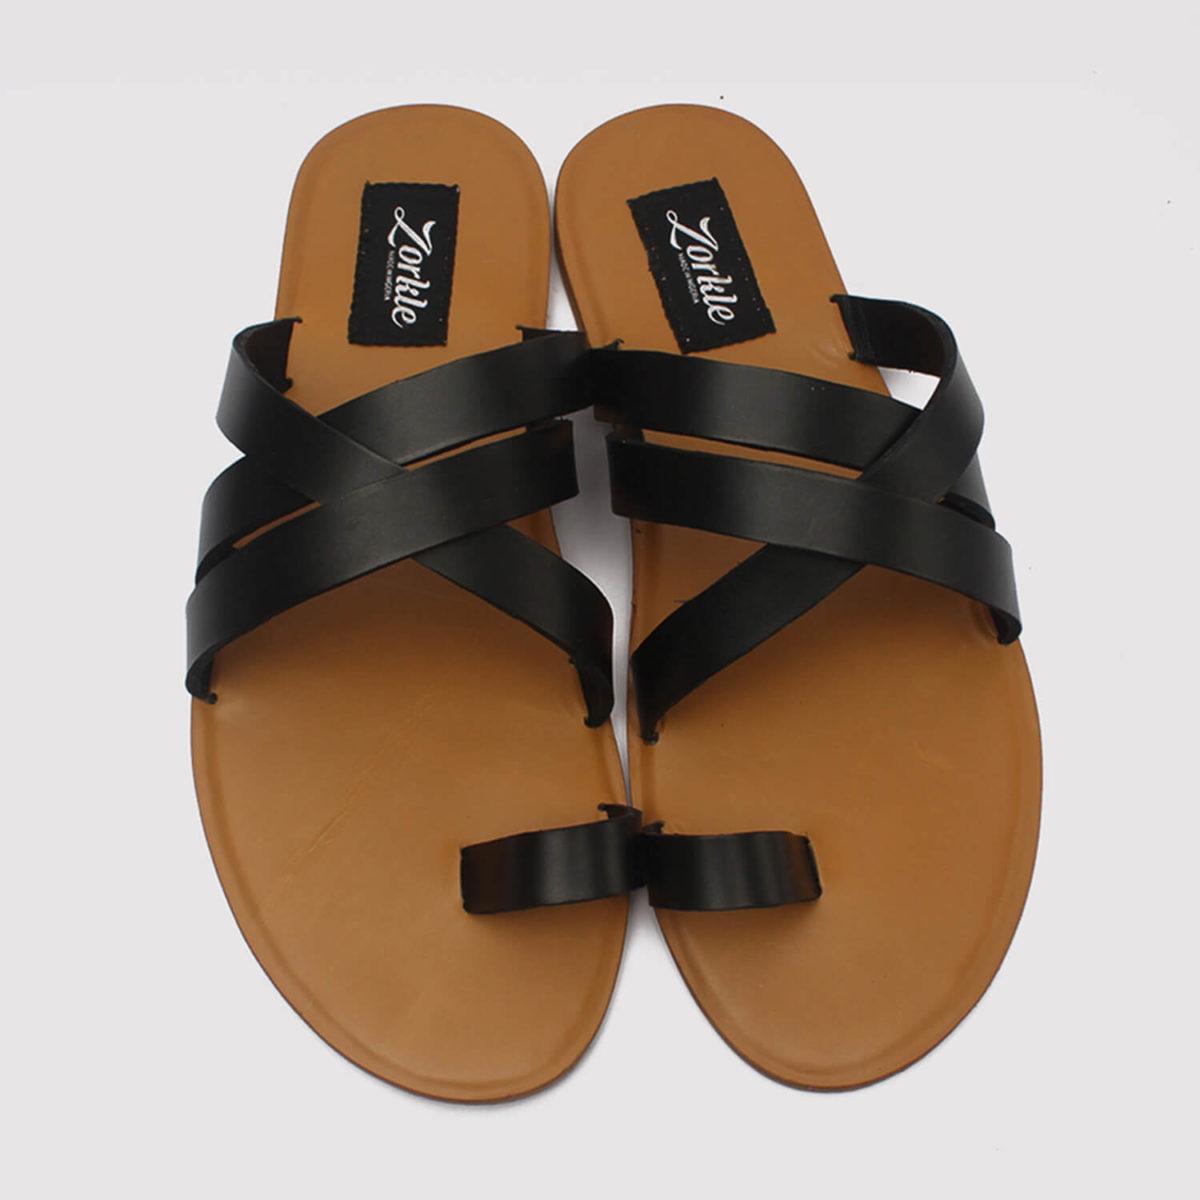 antler black leather zorkle shoes lagos nigeria